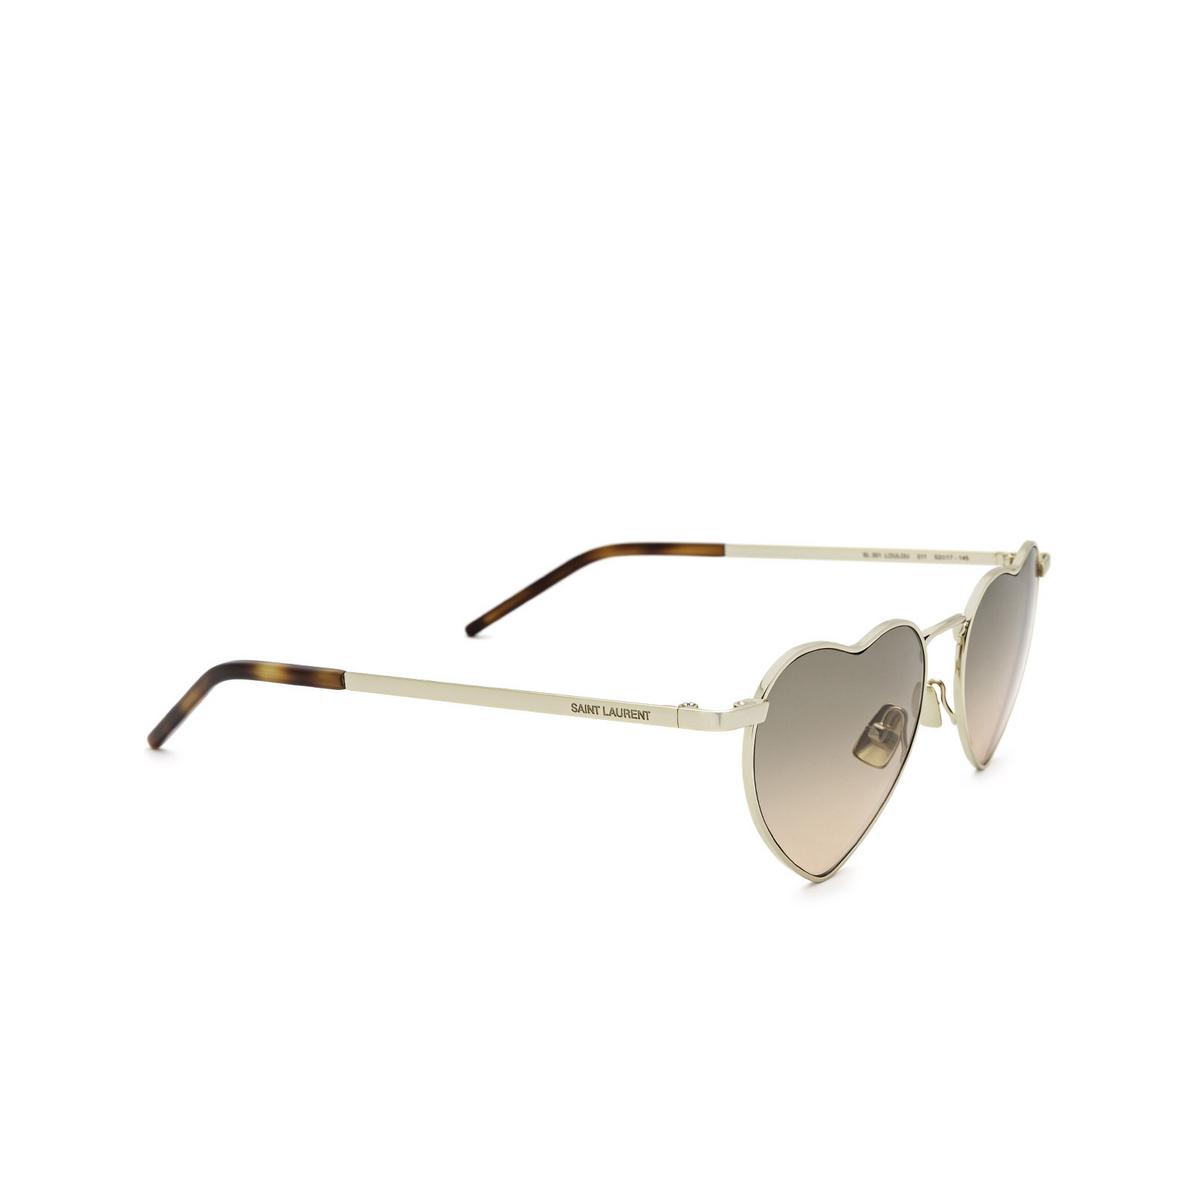 Saint Laurent® Irregular Sunglasses: Loulou SL 301 color Gold 011 - three-quarters view.